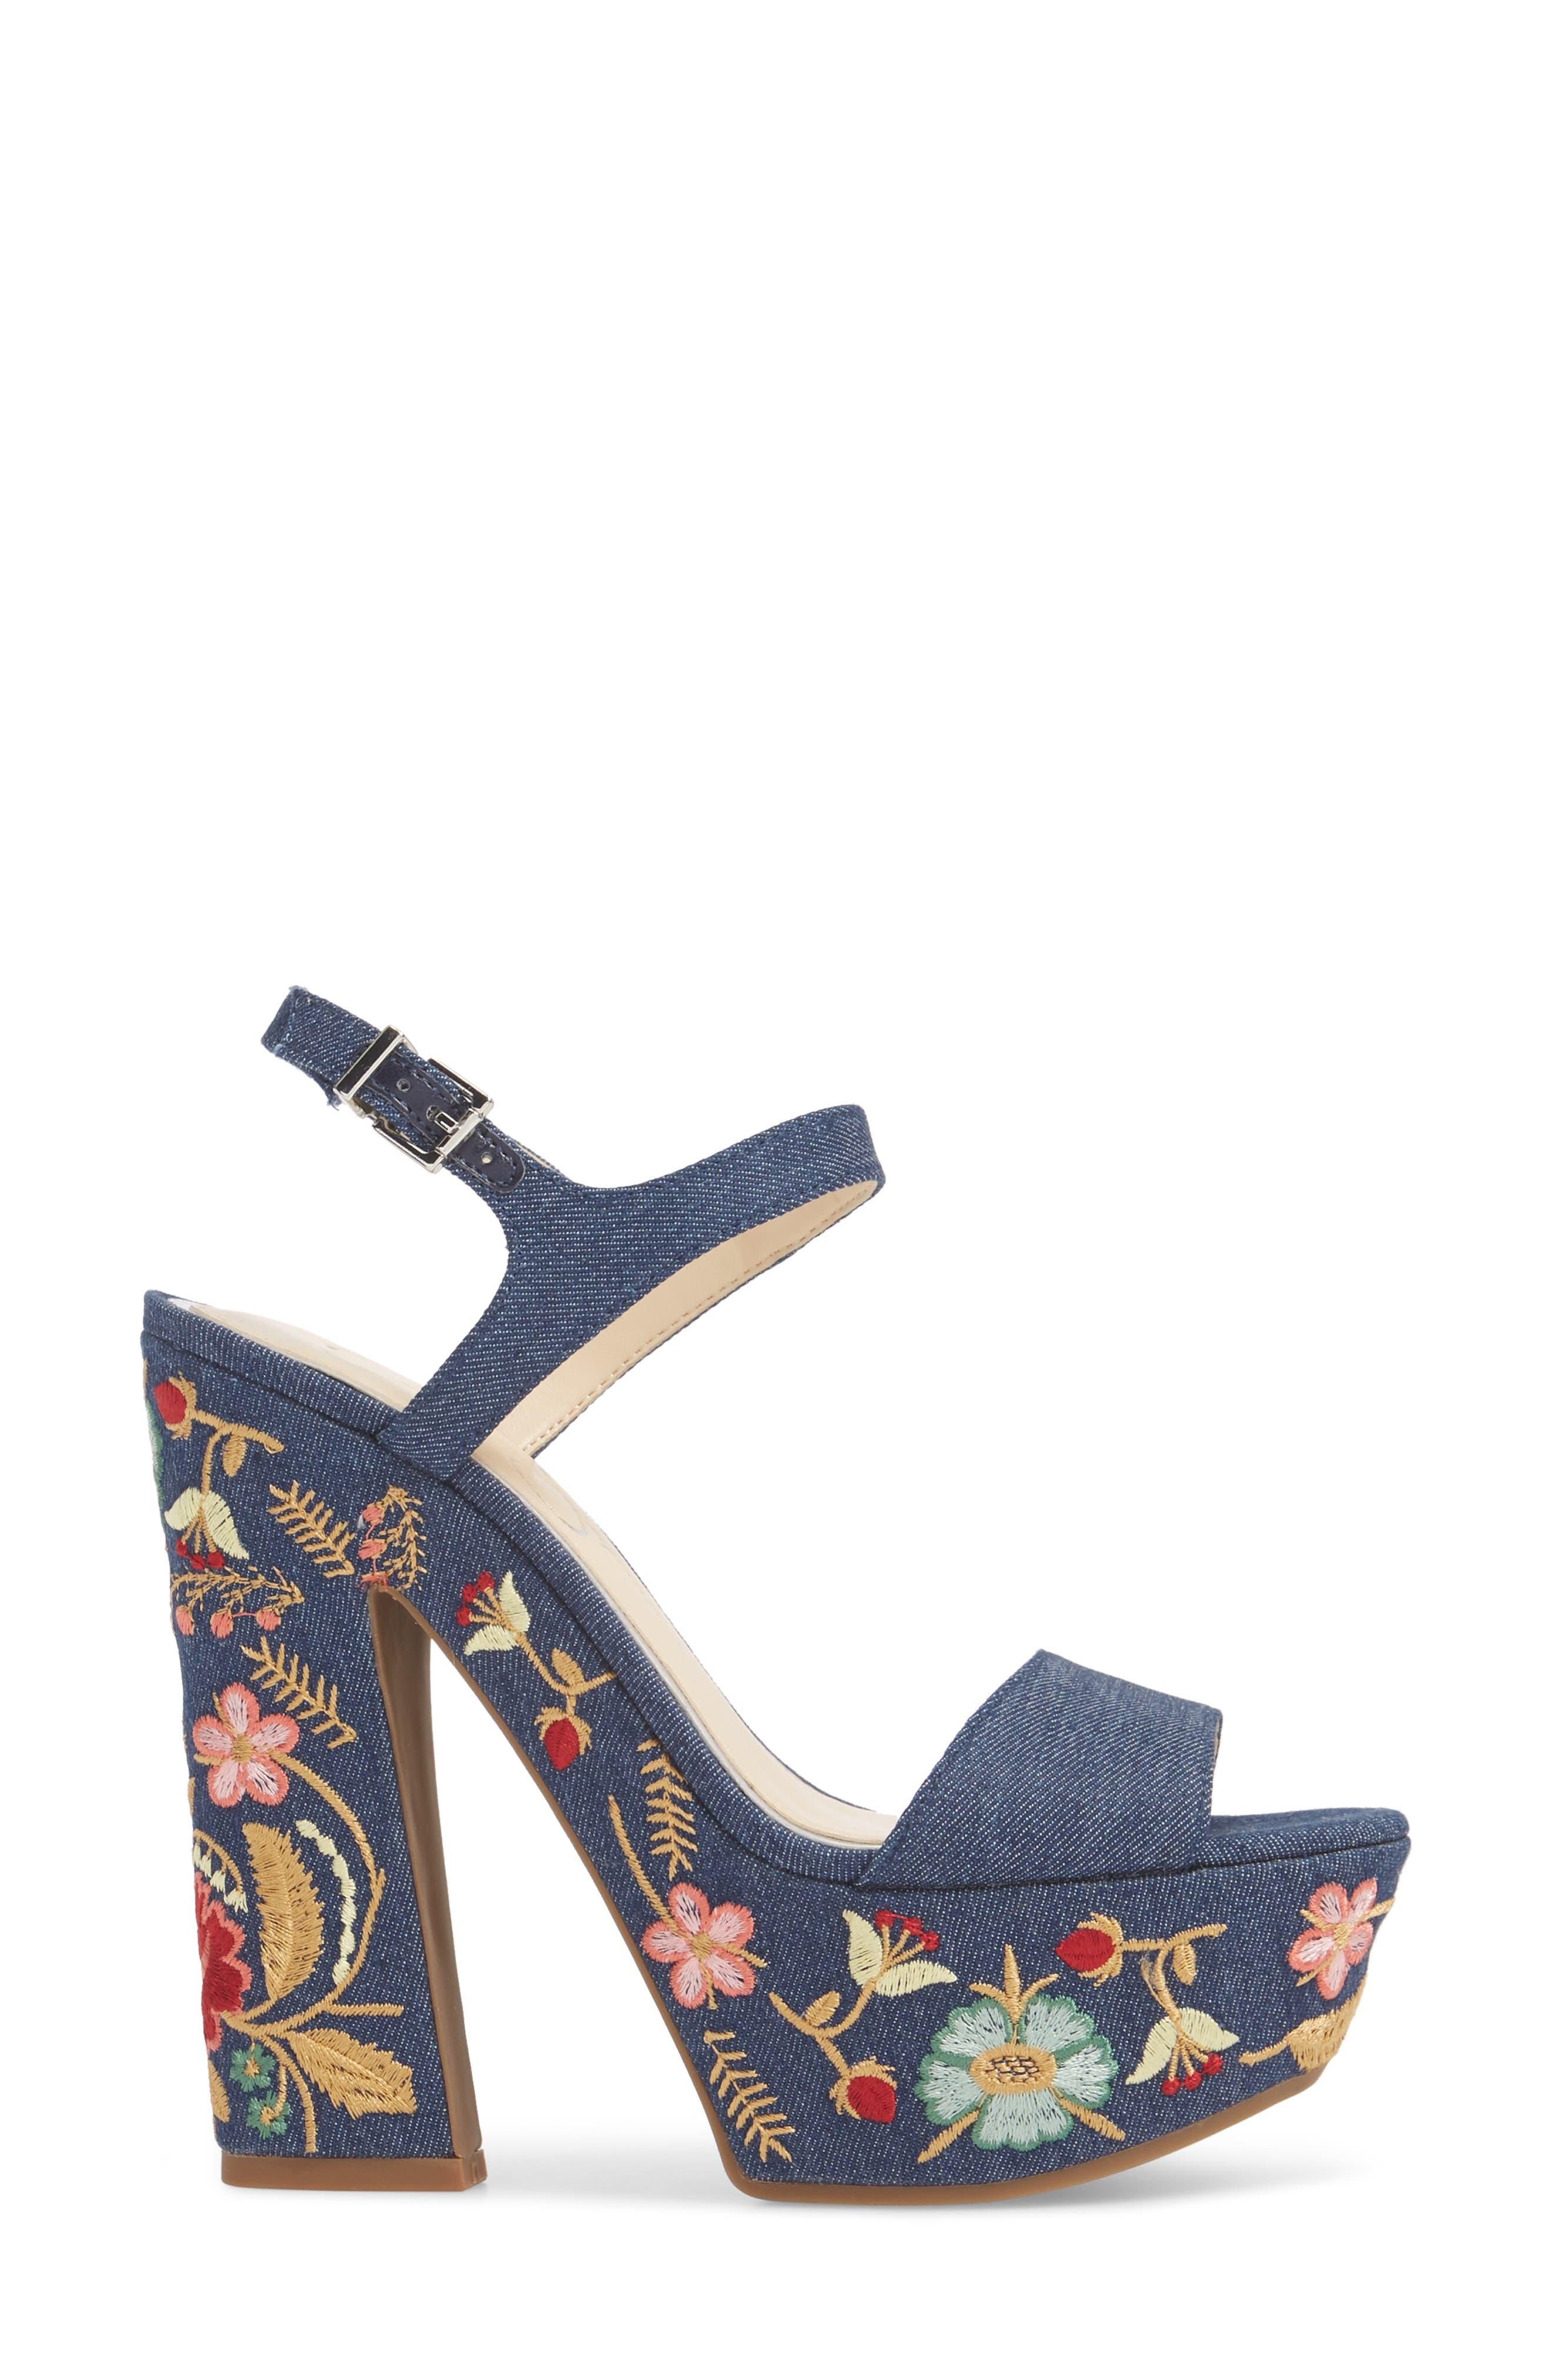 JESSICA SIMPSON,                             Divella Embroidered Platform Sandal,                             Alternate thumbnail 3, color,                             410